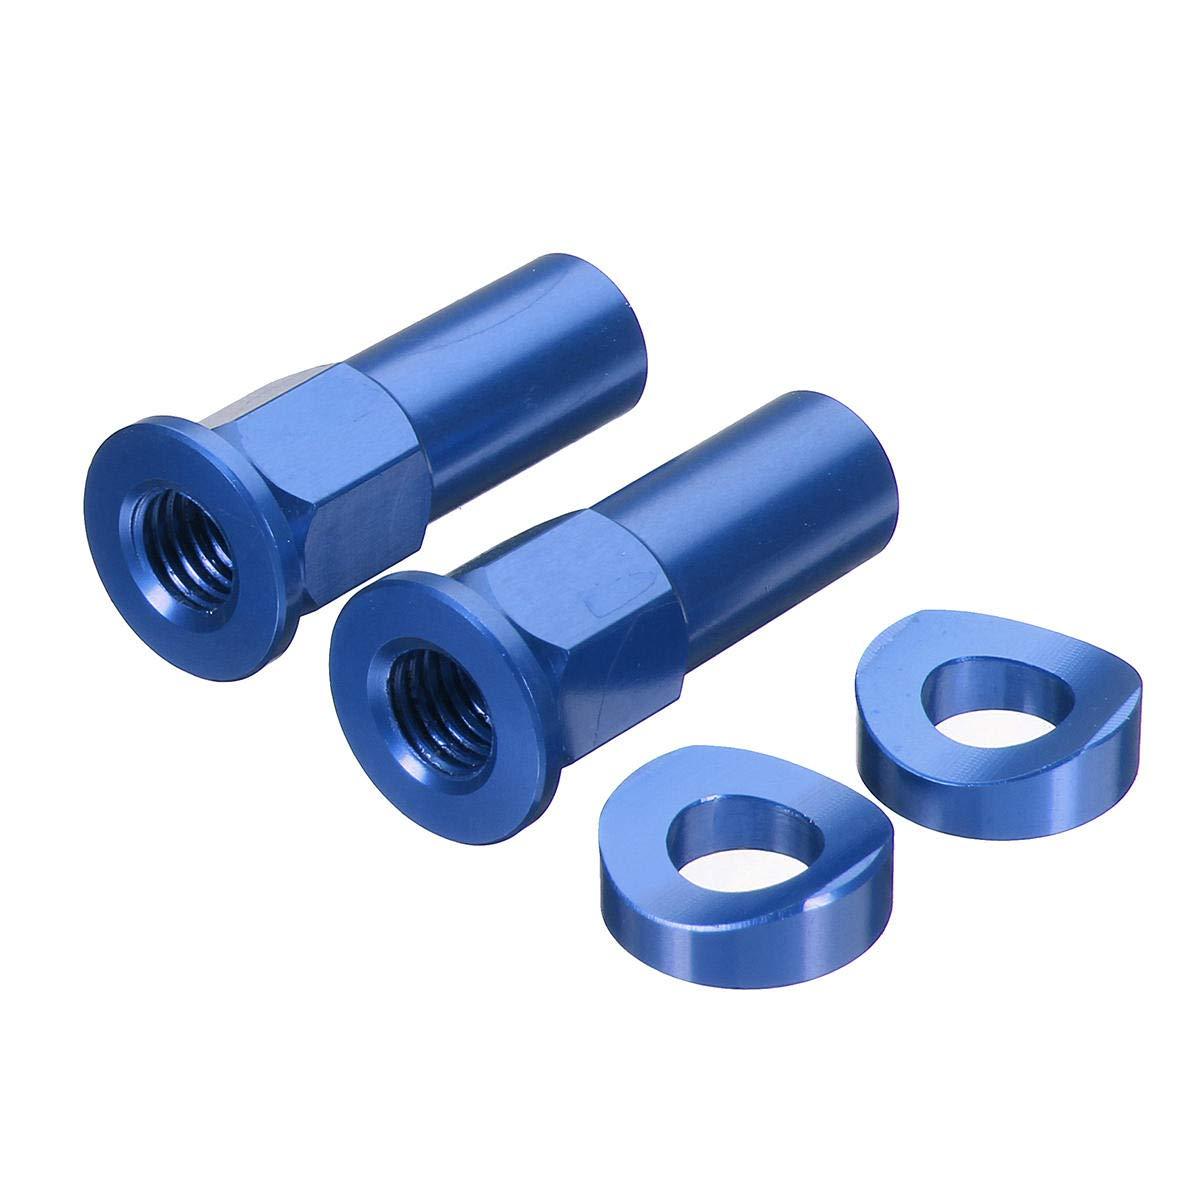 CNC Tusk Rim Lock Nuts Spacer Kit For Honda//Yamaha//KTM//Suzuki//Kawasaki//MX//Enduro Red - 2 X Rim Locks 2 X Washers Motorcycle Motorcycle Tires /& Parts -